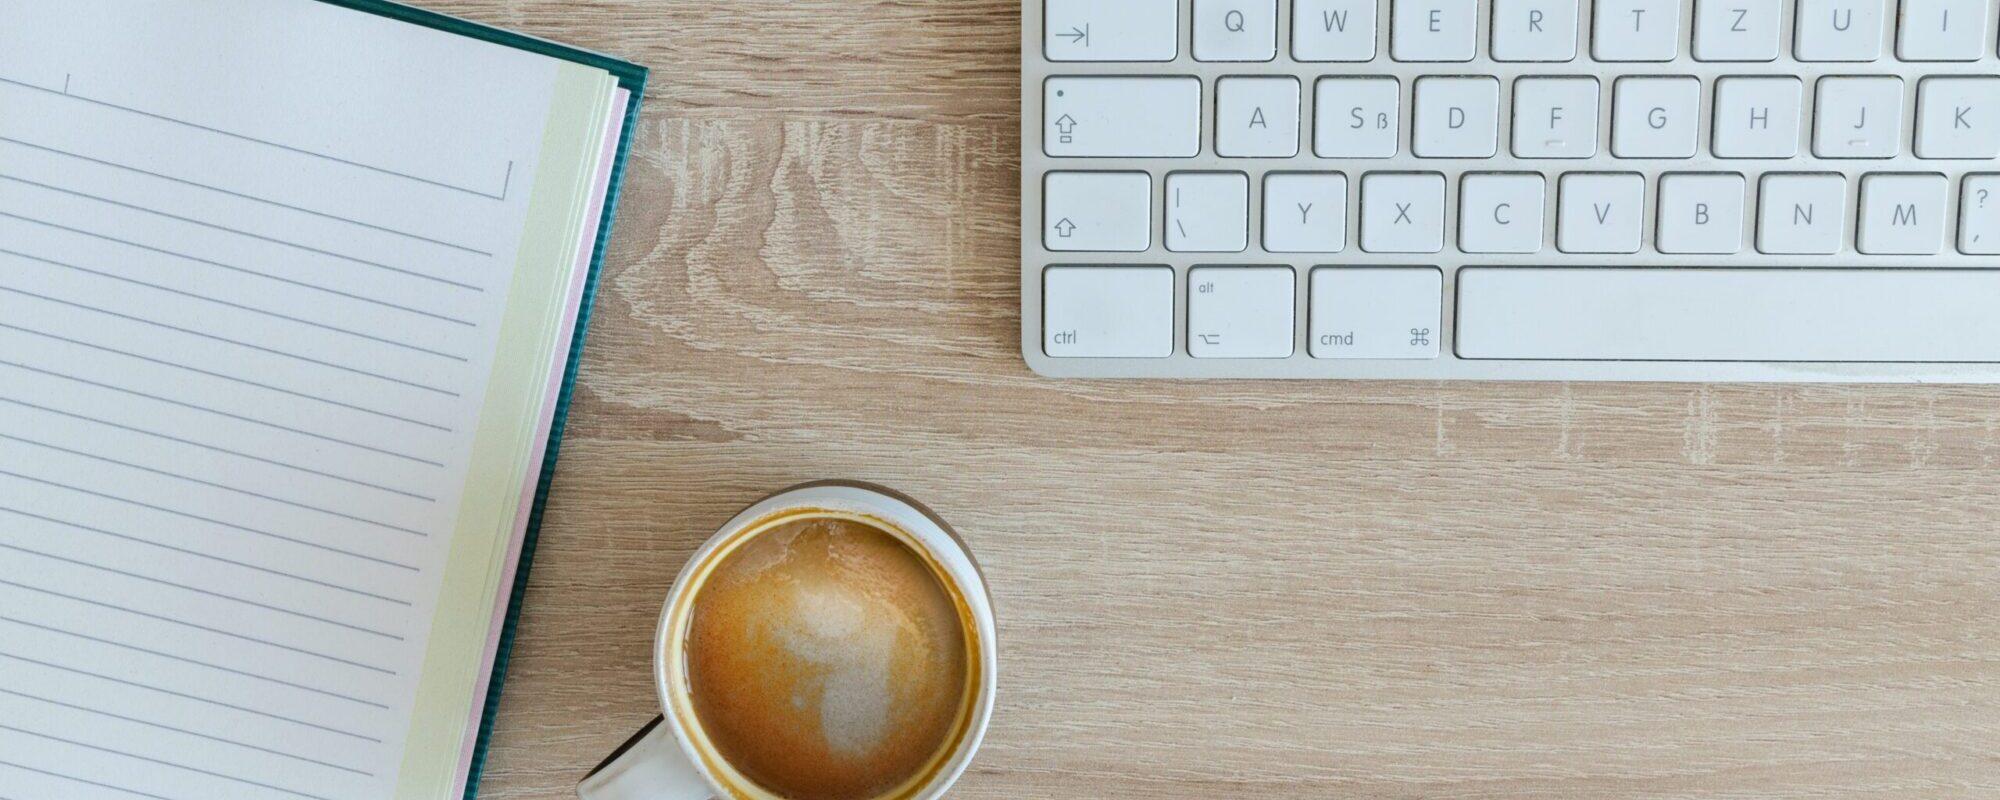 gode råd til blogindlæg webbureau